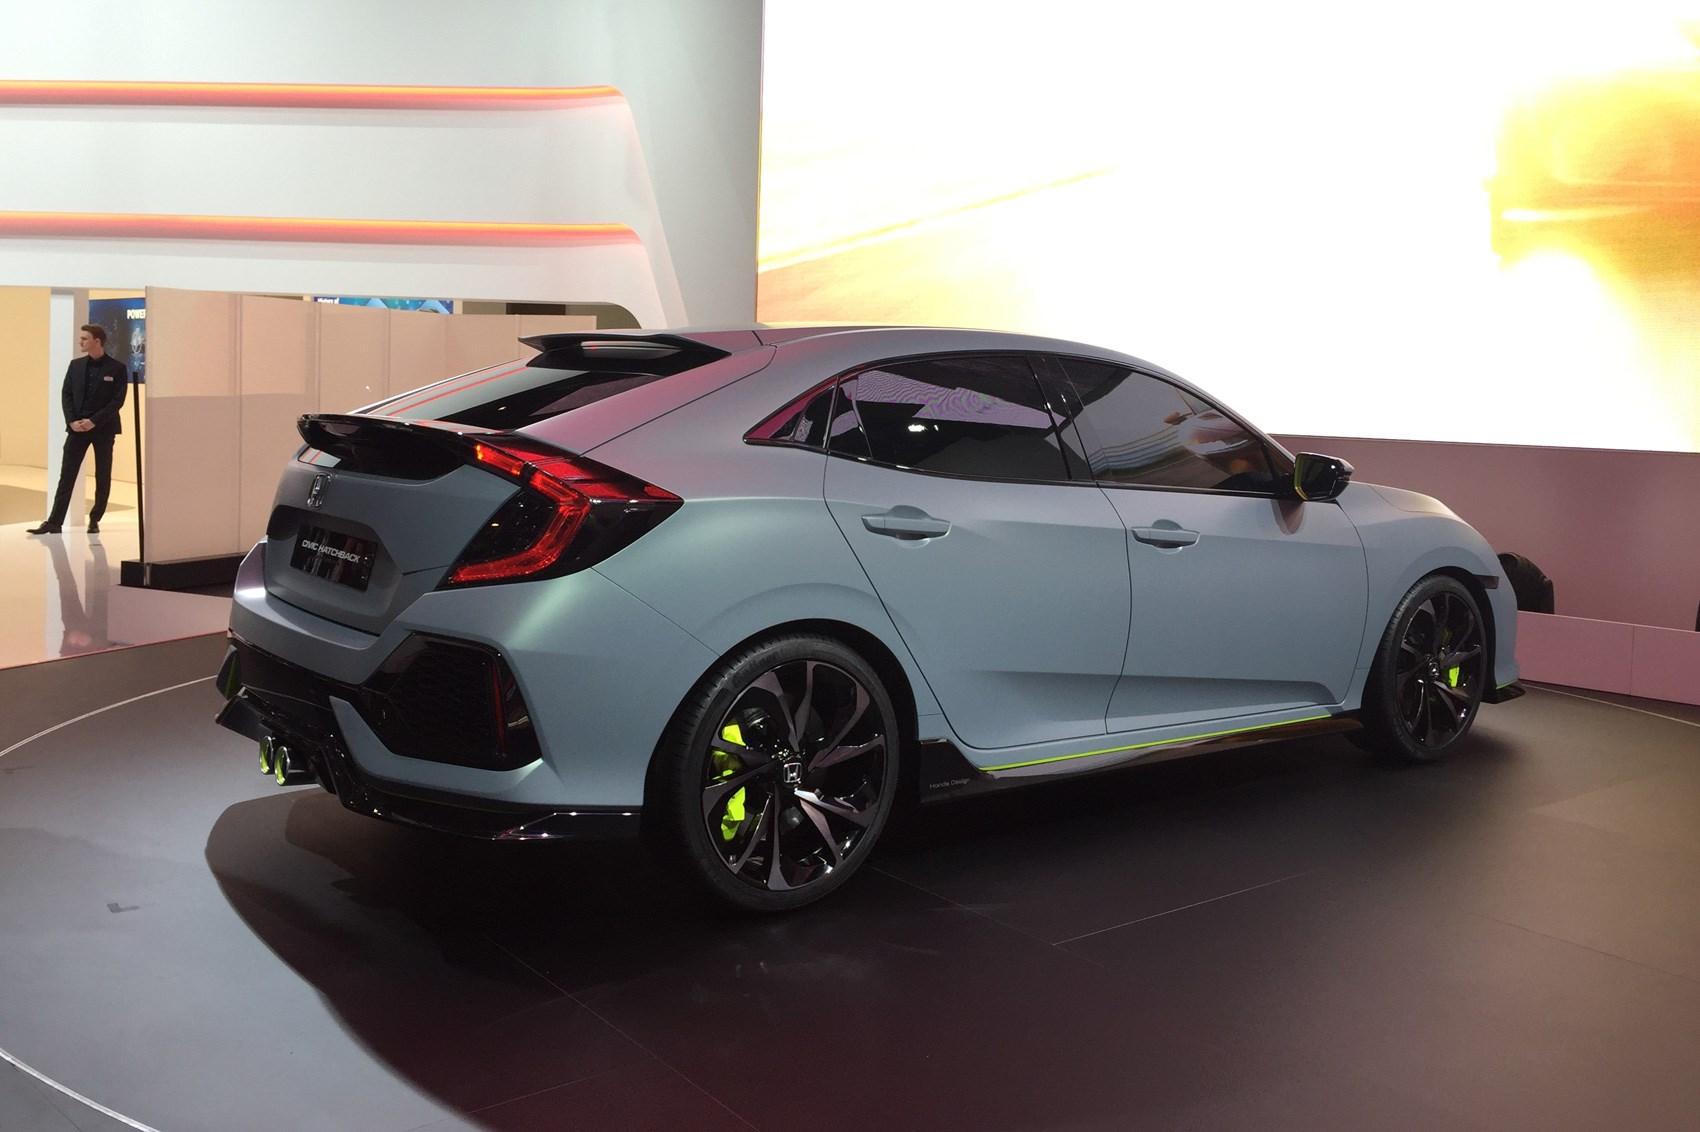 New 2017 Honda Civic Prototype Unveiled In Geneva Car